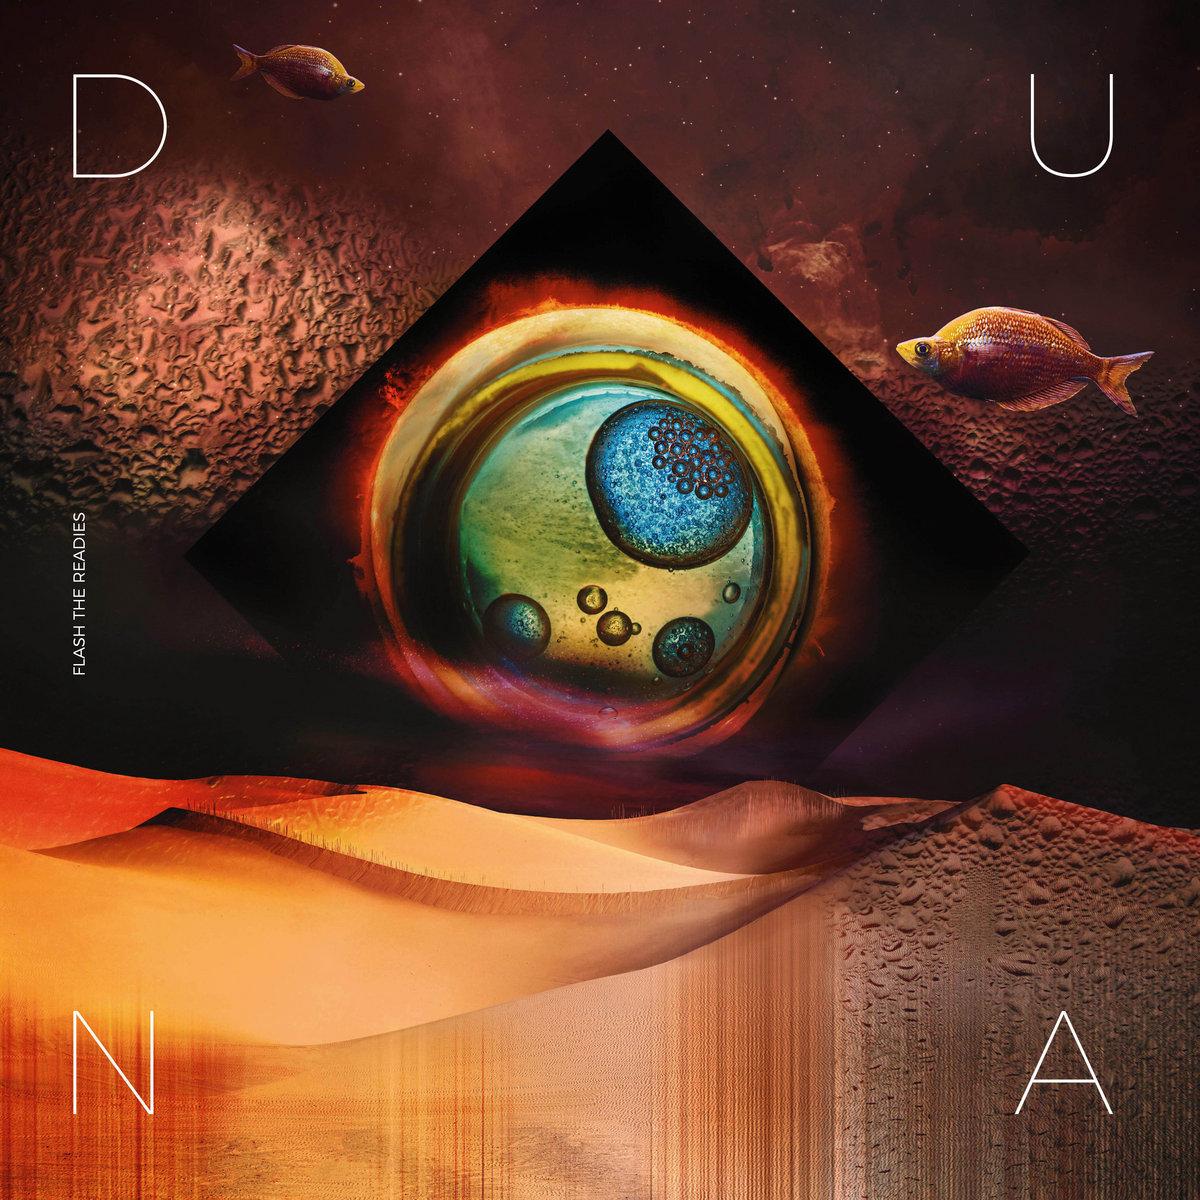 Flash the Readies: Duna